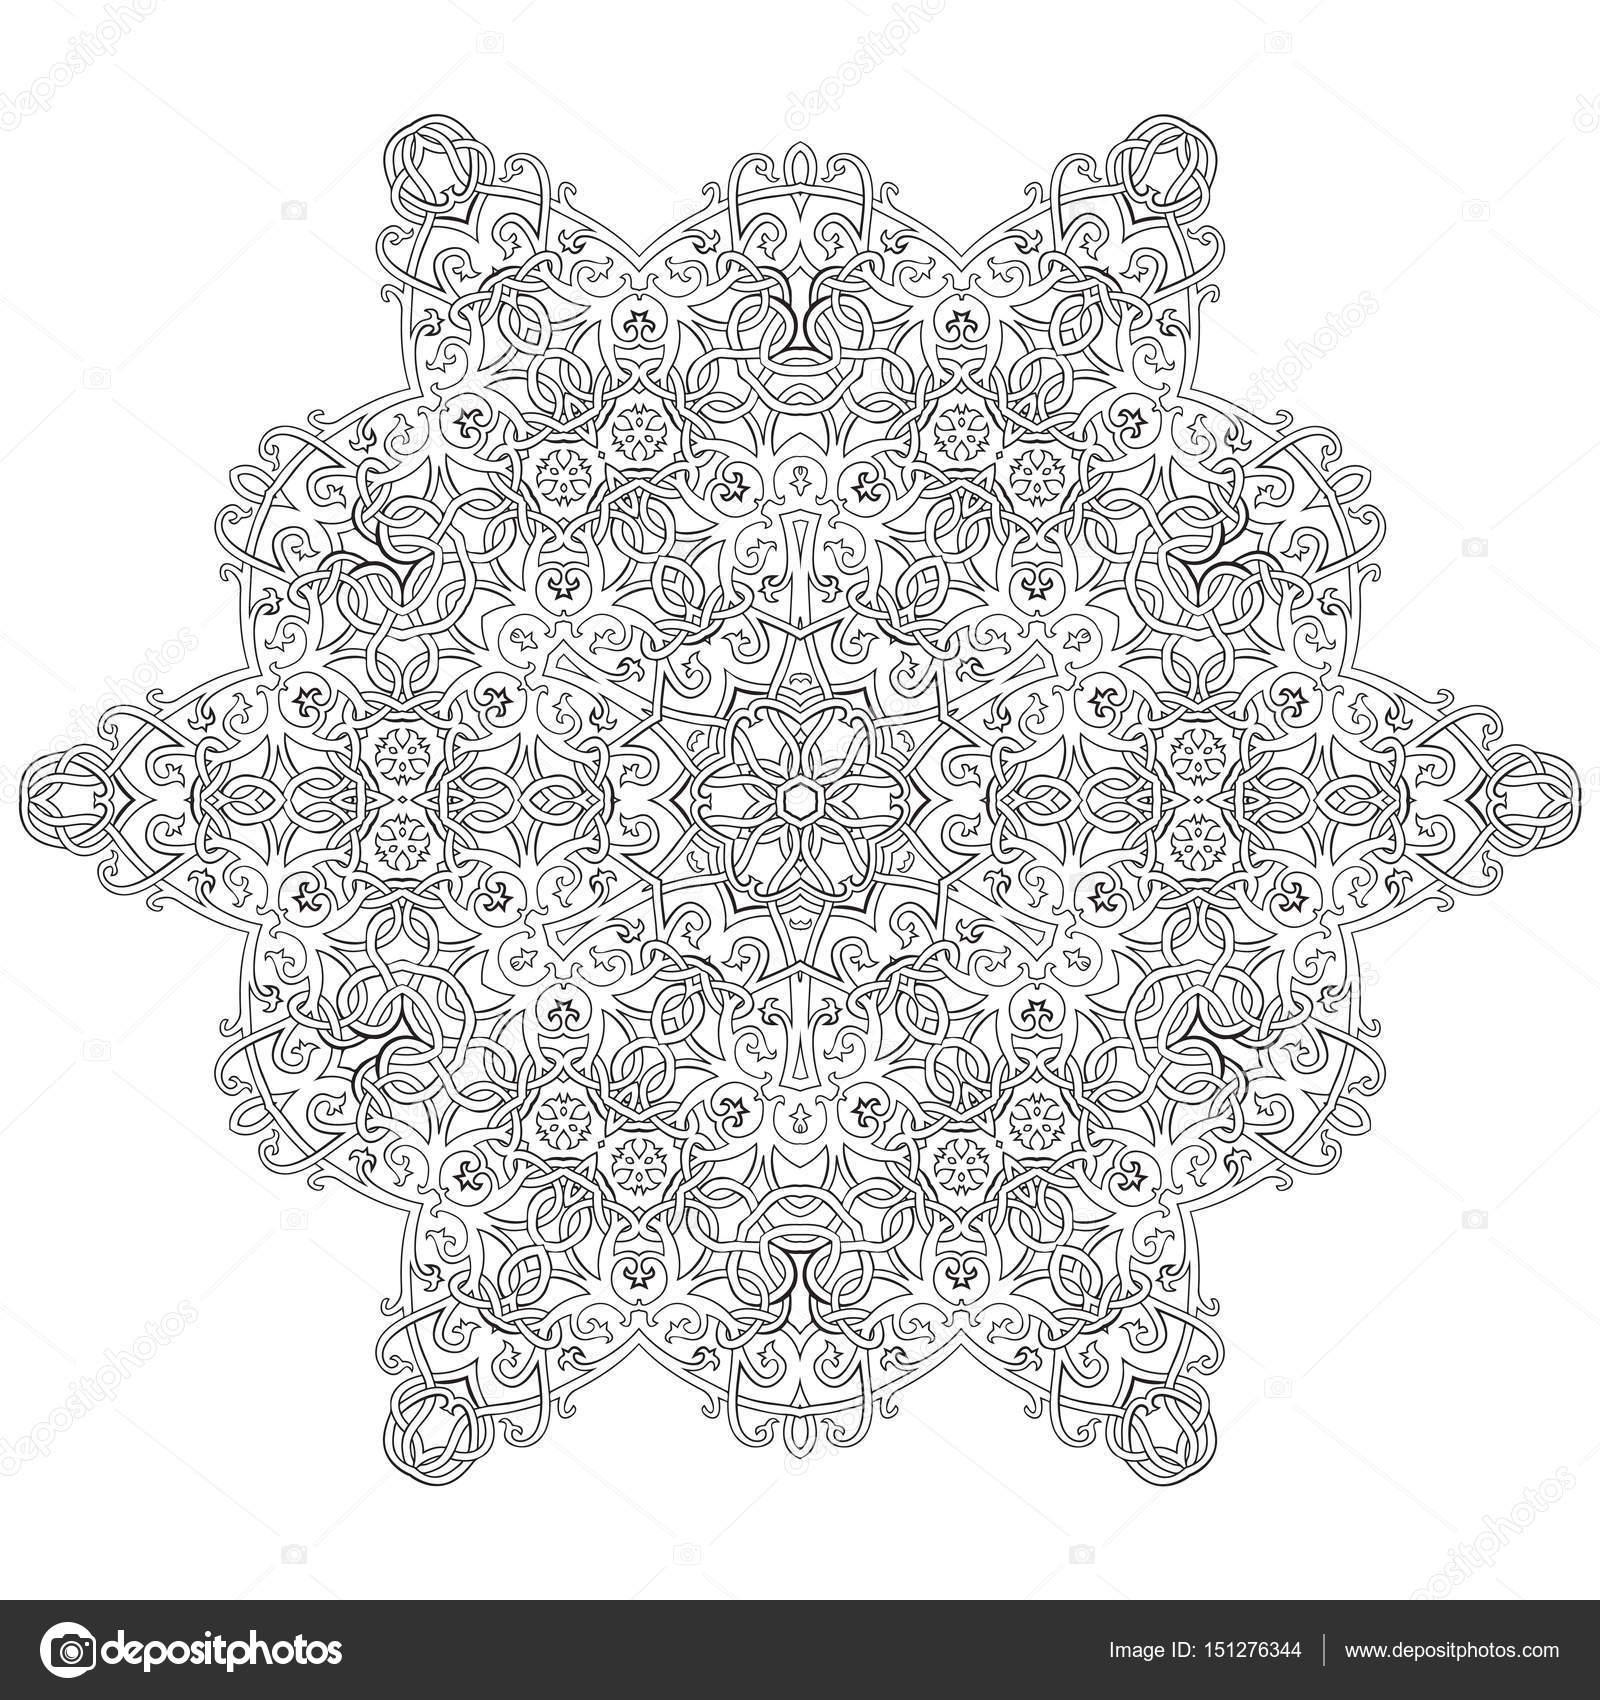 Kleurplaten Keltische Mandala.Vectorillustratie Van Keltische Knoop Stijl Kleurplaat Mandala Boek